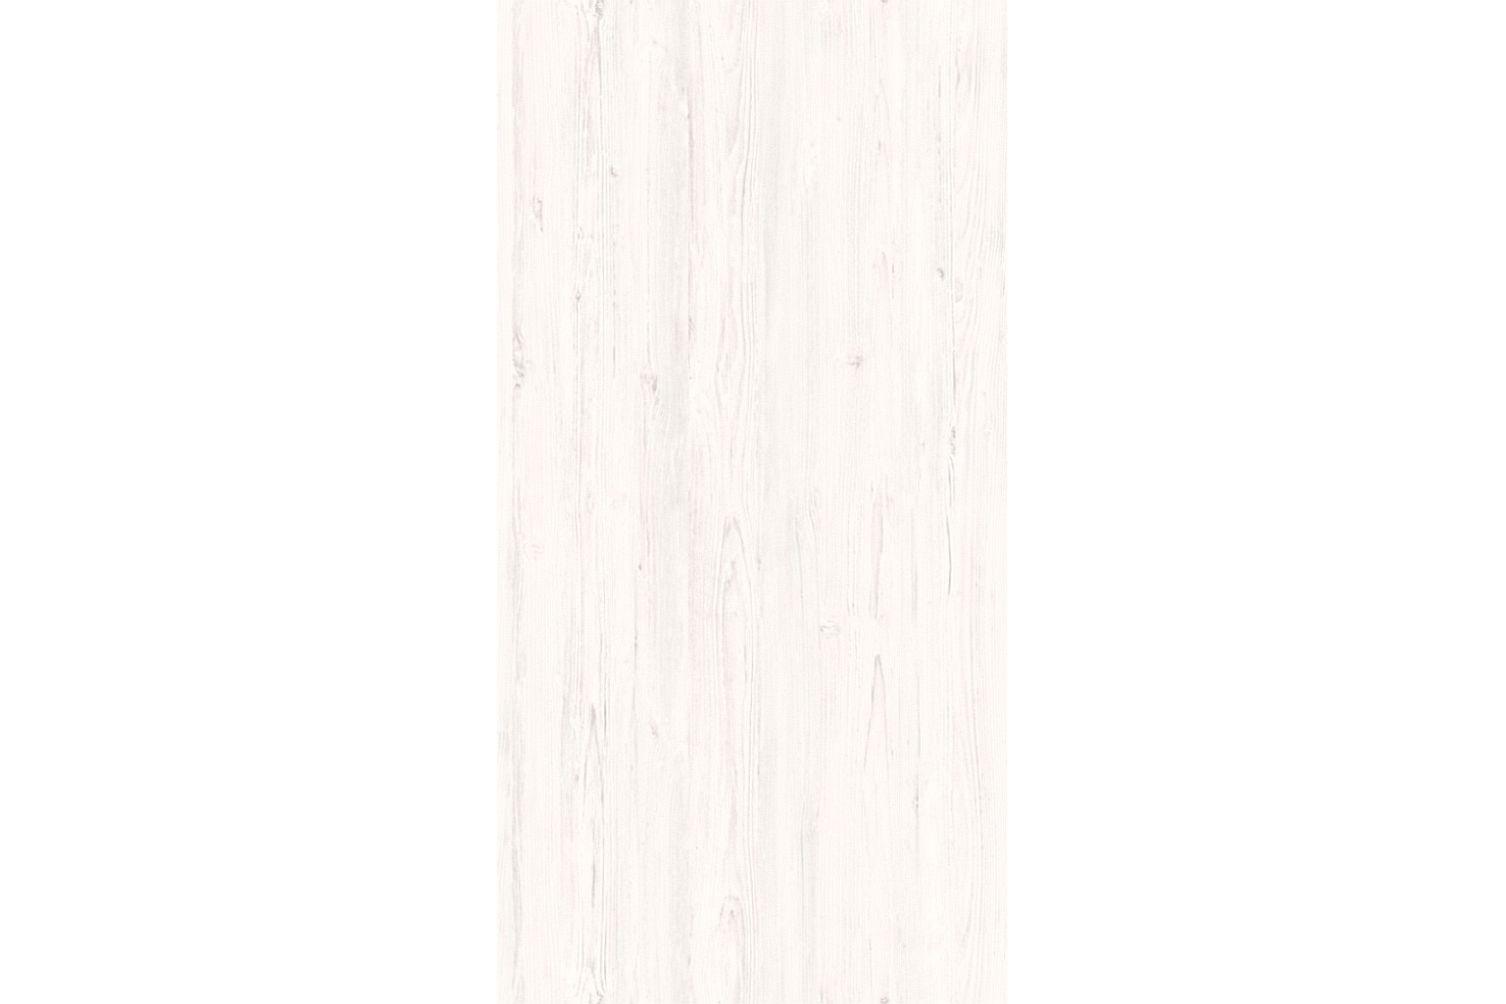 Seitenvitrine Dandy 0680/1-1GL_K anderson pine/stirling oak